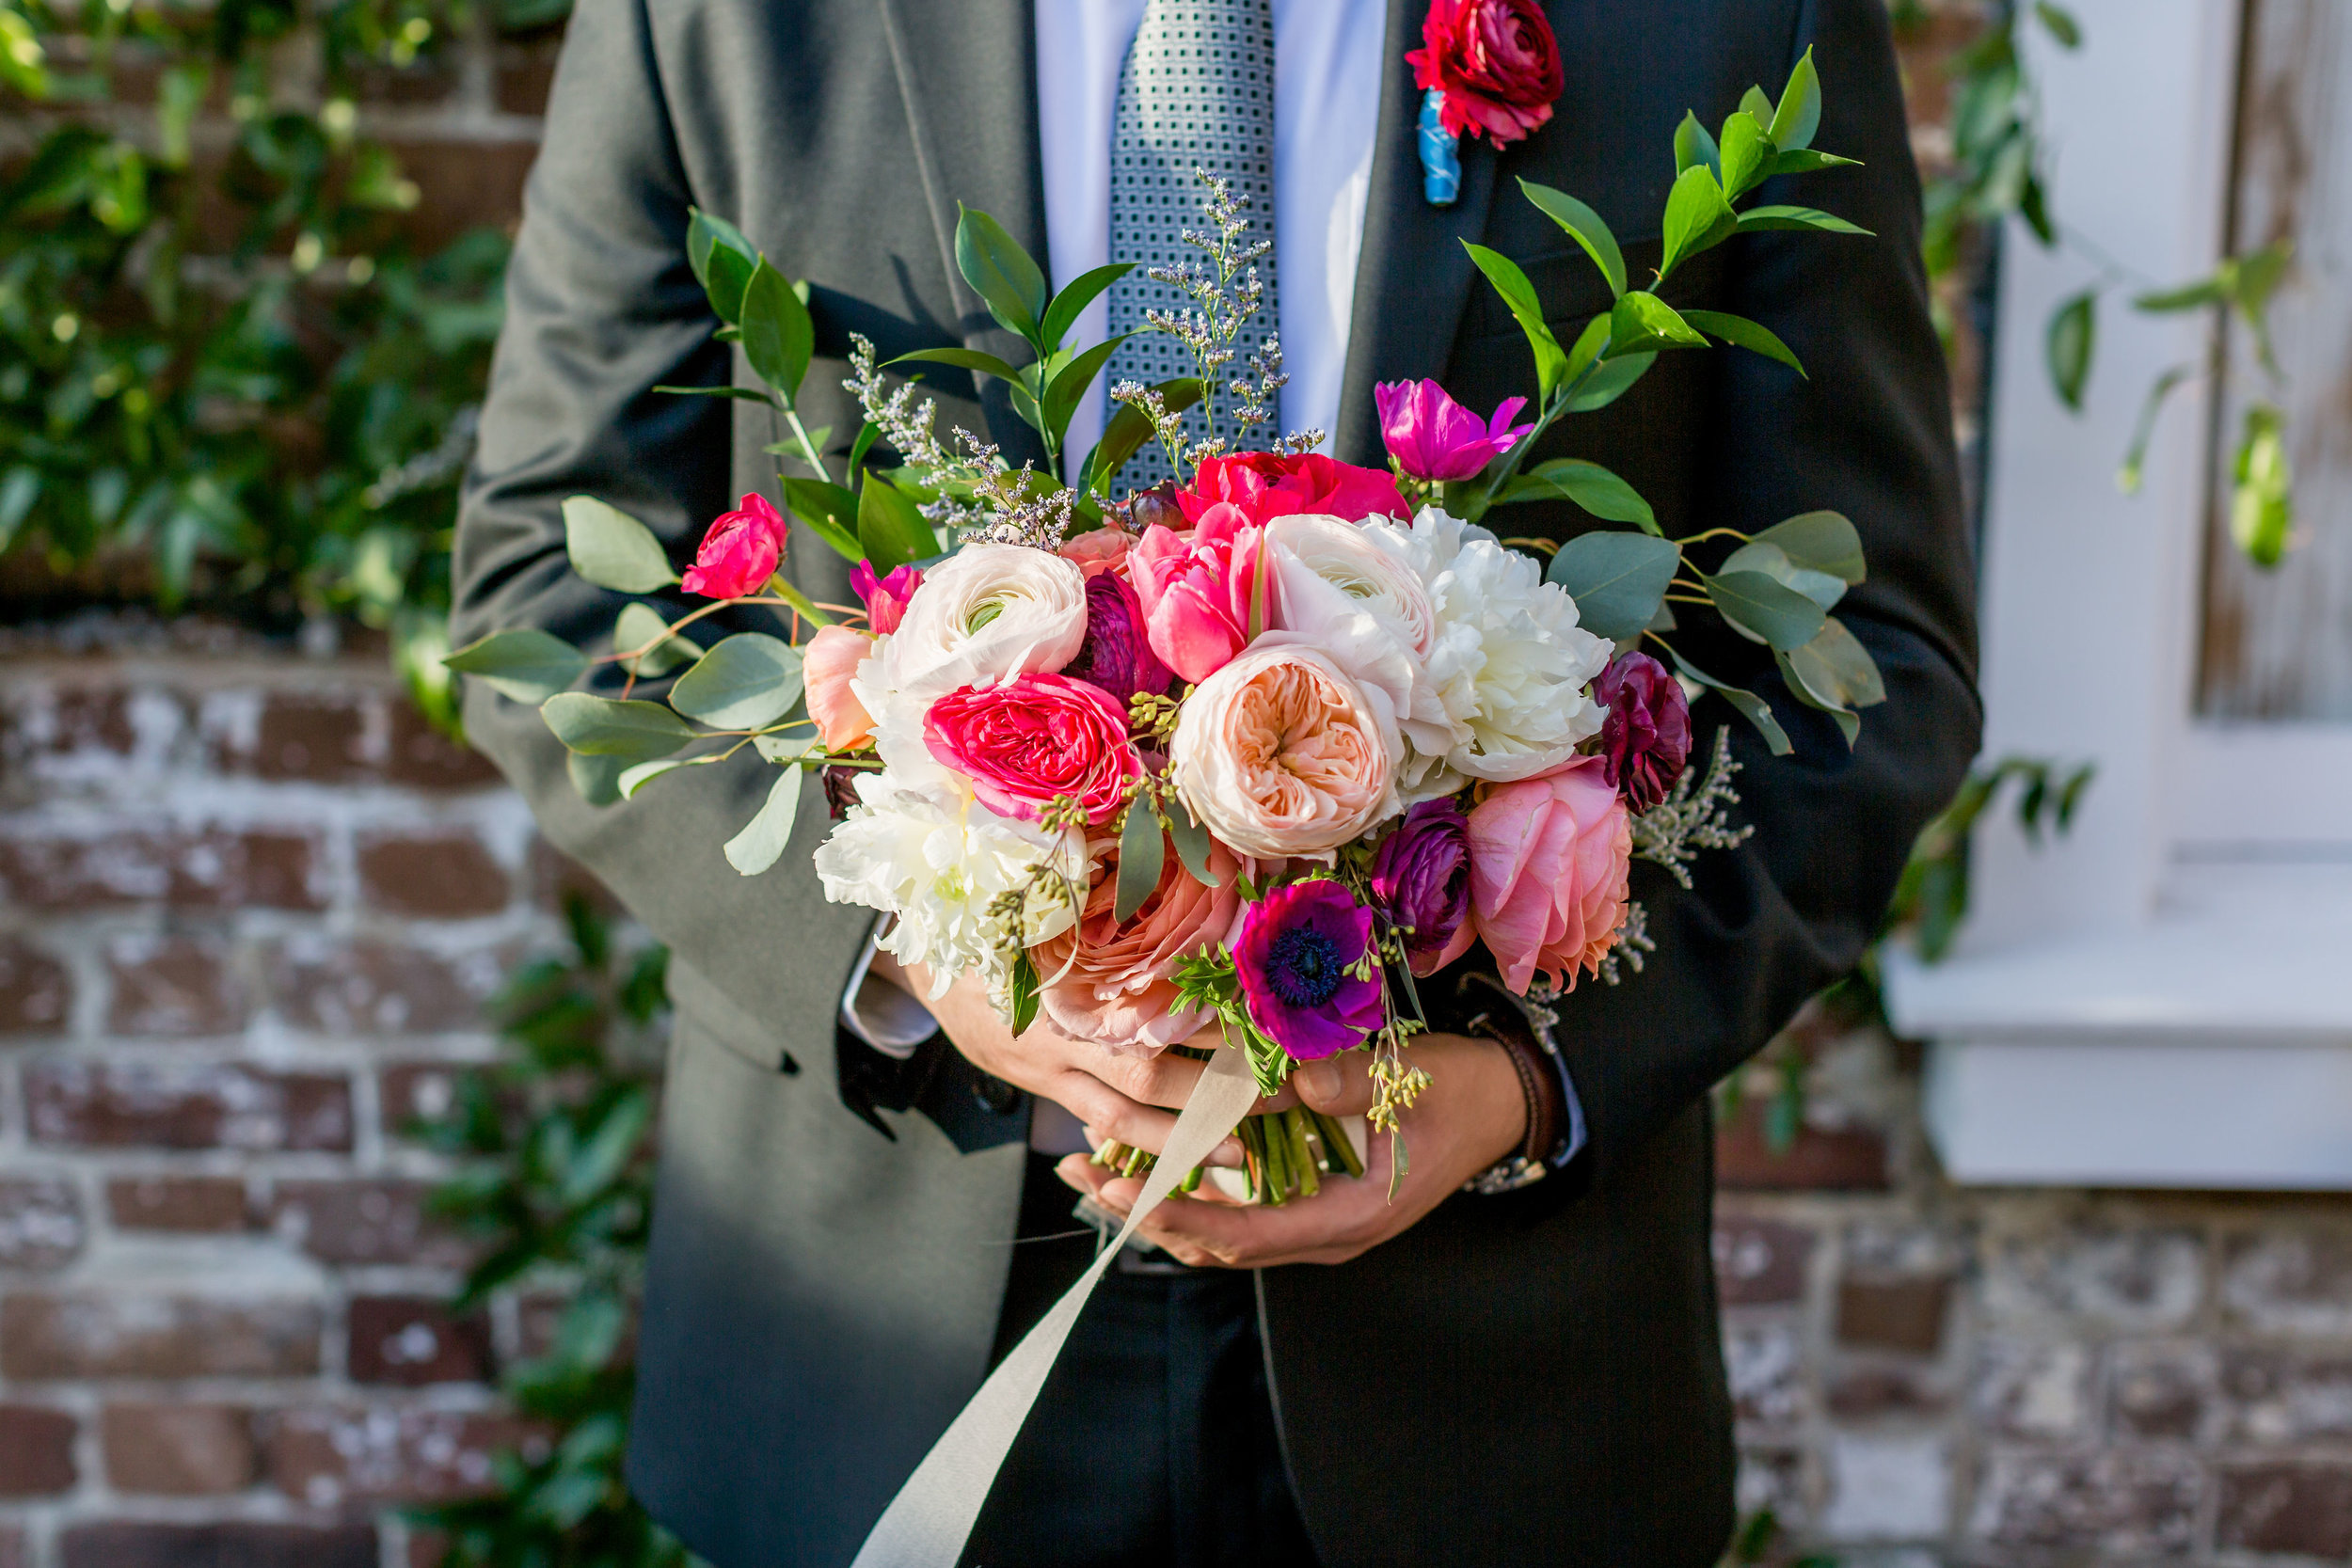 charleston new years elopement popup surprise wedding at upstairs at midtown - scarlet plan & design wedding planners (341).jpg